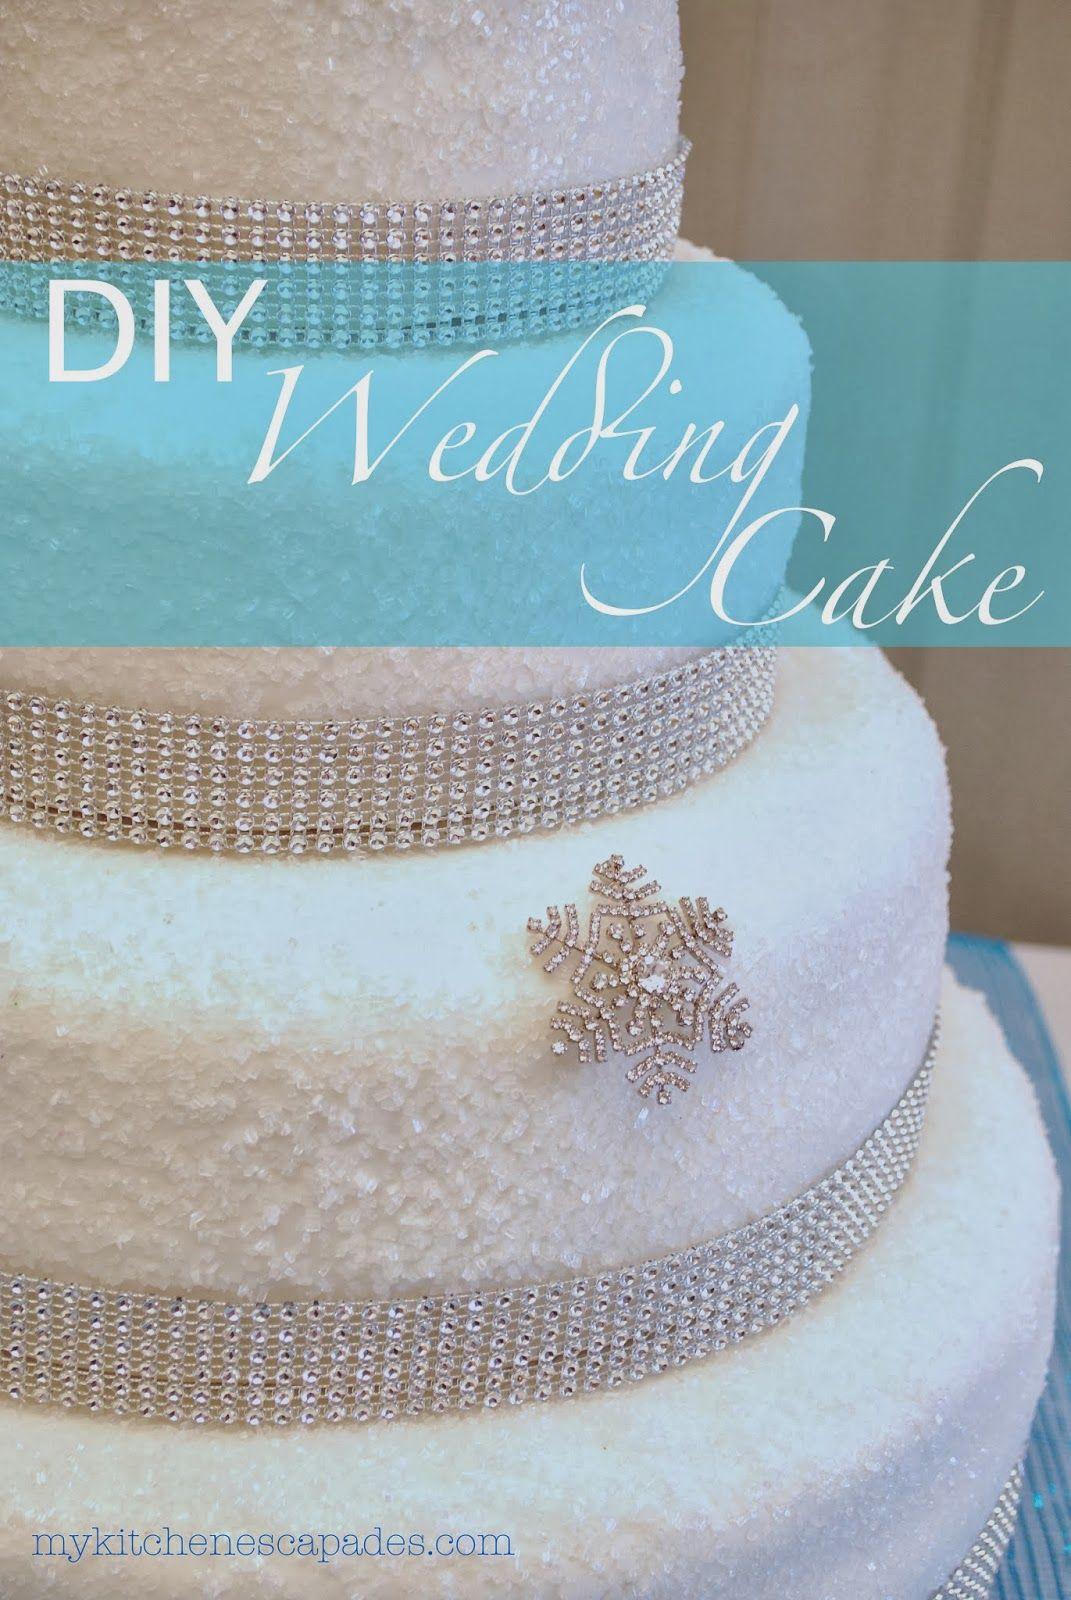 Diy Wedding Cake Wedding Cake Diy Wedding Cake And Cake